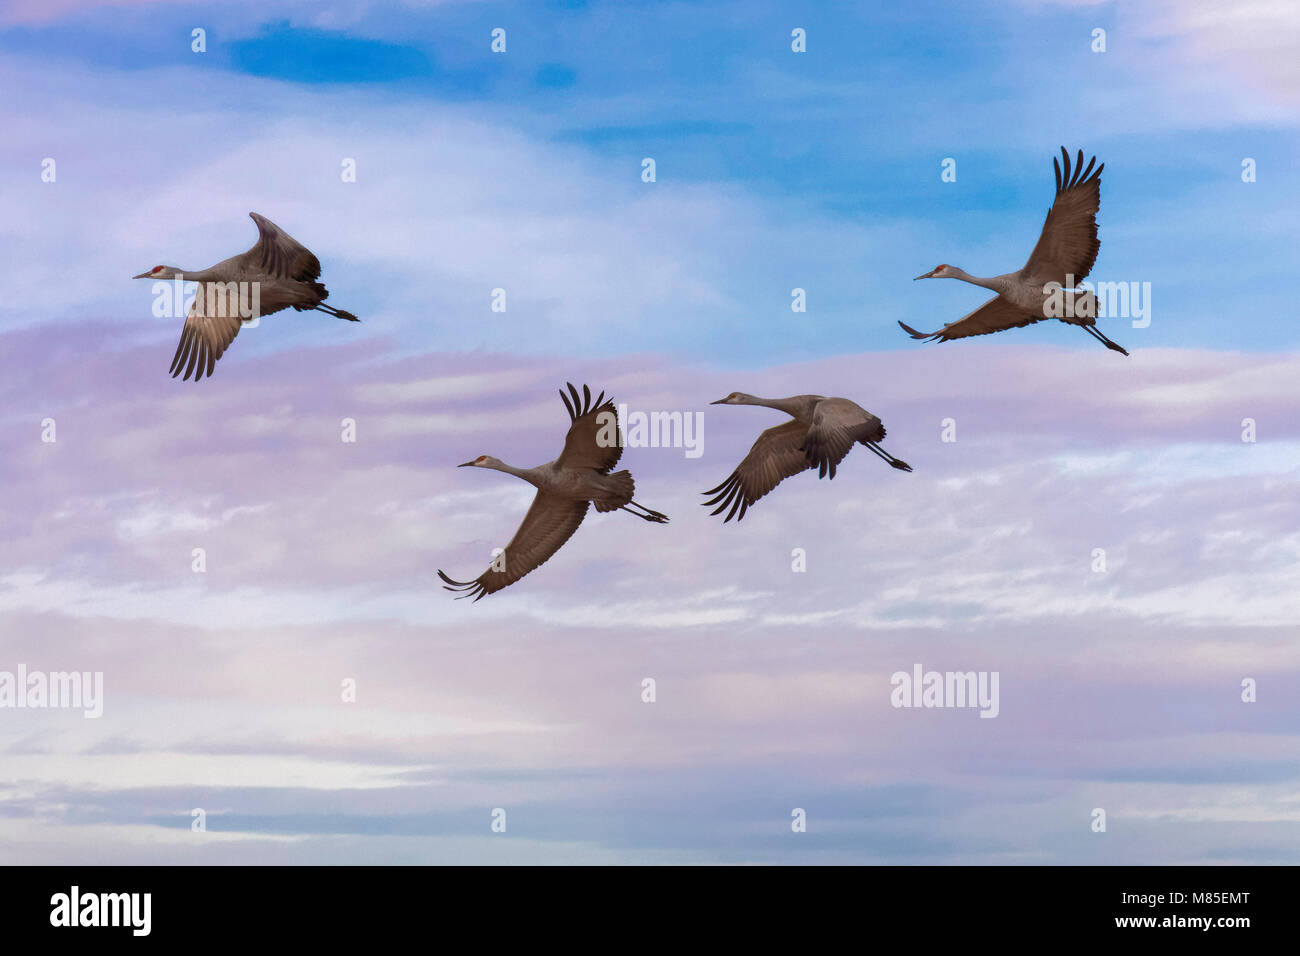 Sandhill Cranes in flight, Southern Arizona - Stock Image